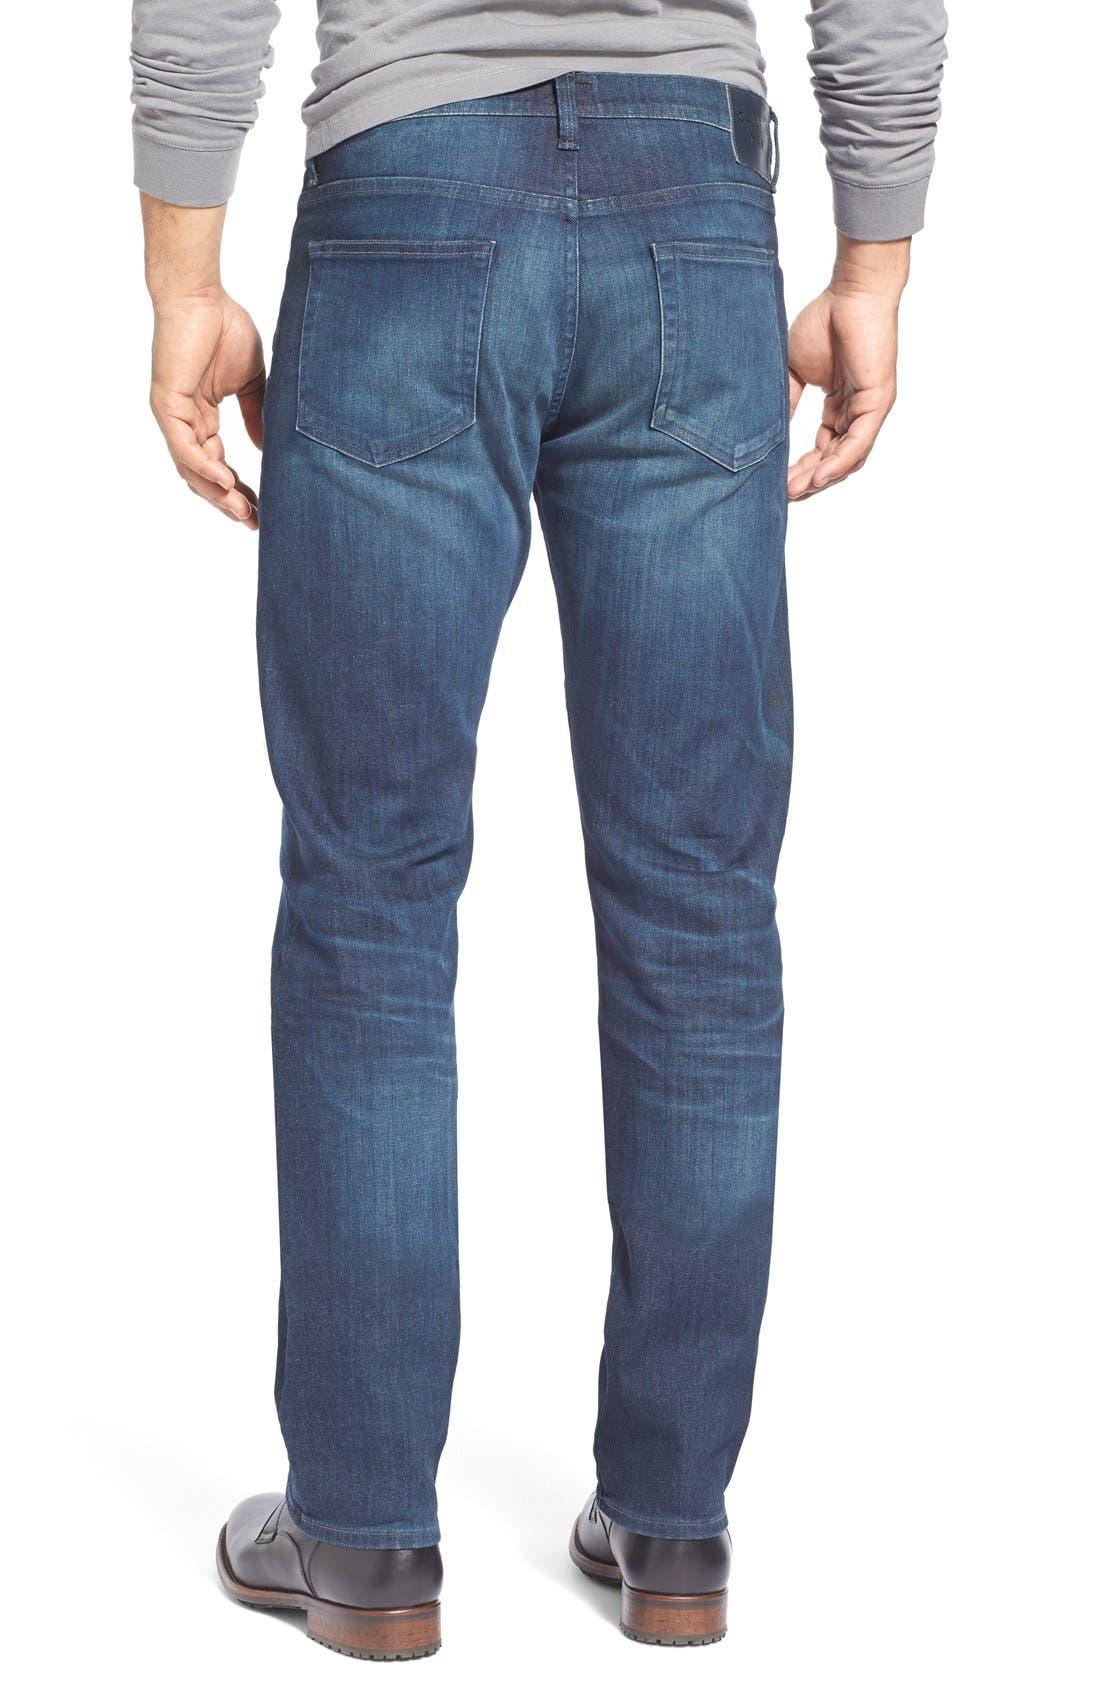 'Sid Classic' Straight Leg Jeans,                             Alternate thumbnail 10, color,                             473